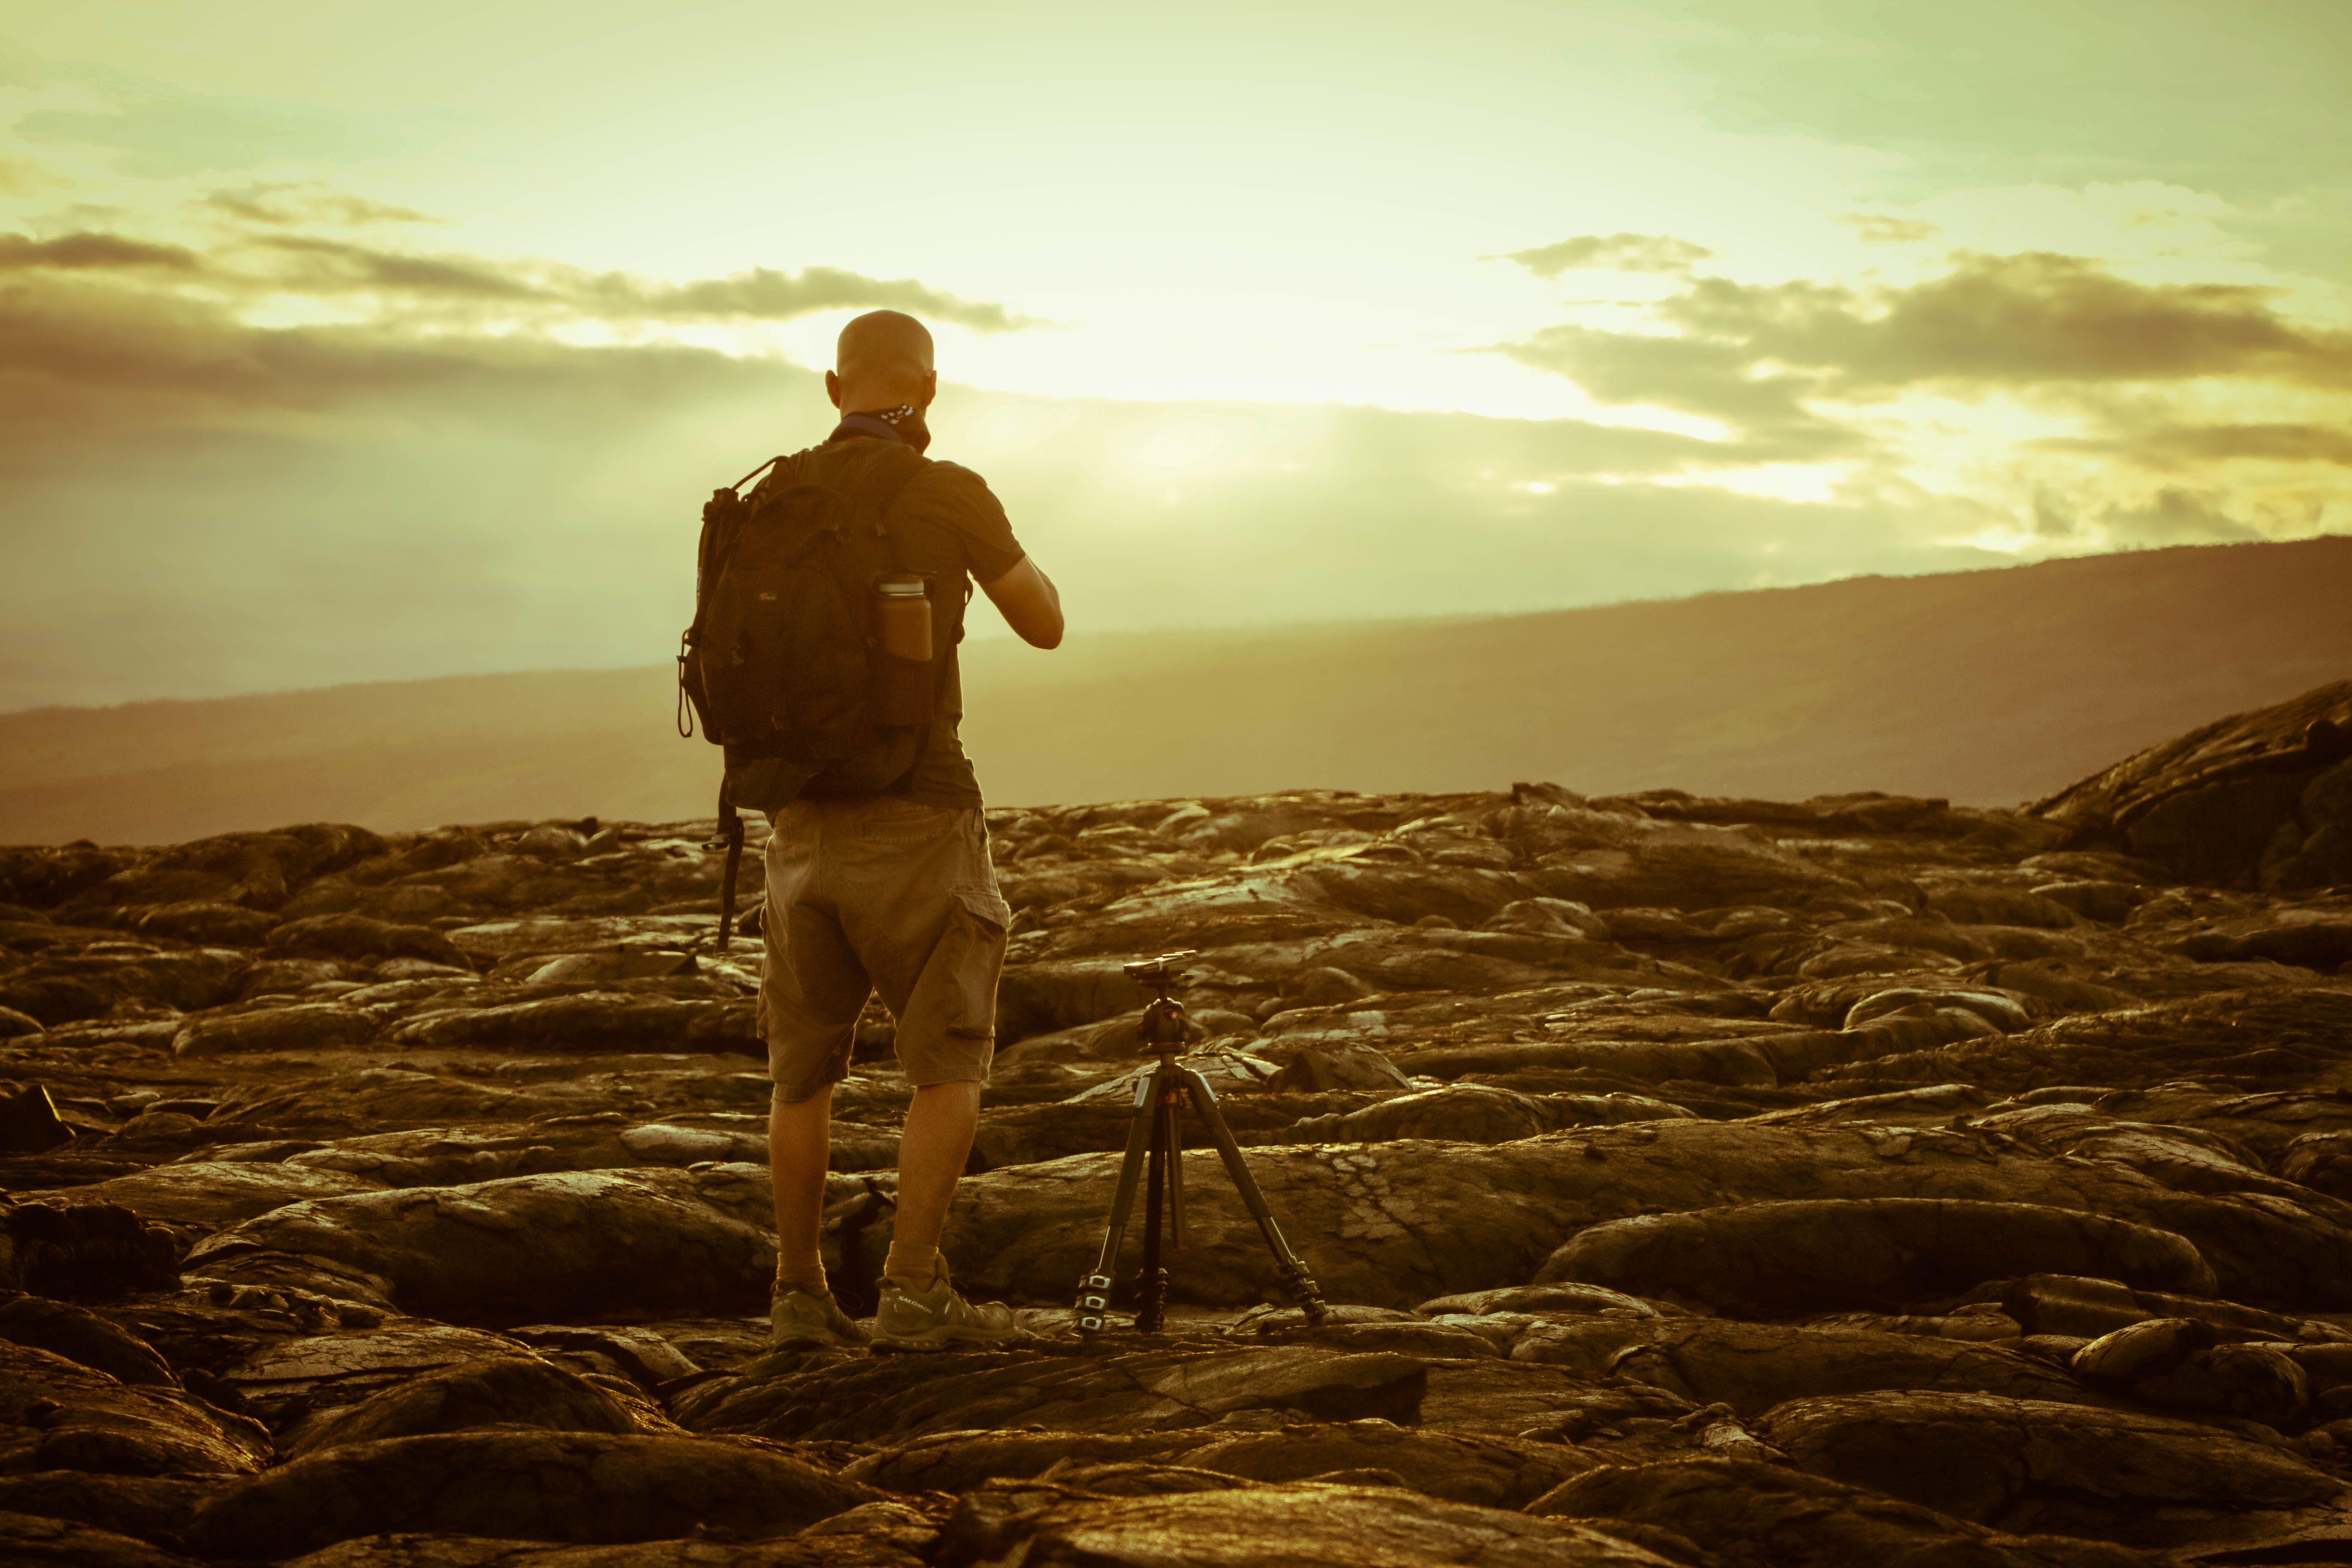 Man Beside Tripod on Rocks during Golden Hour